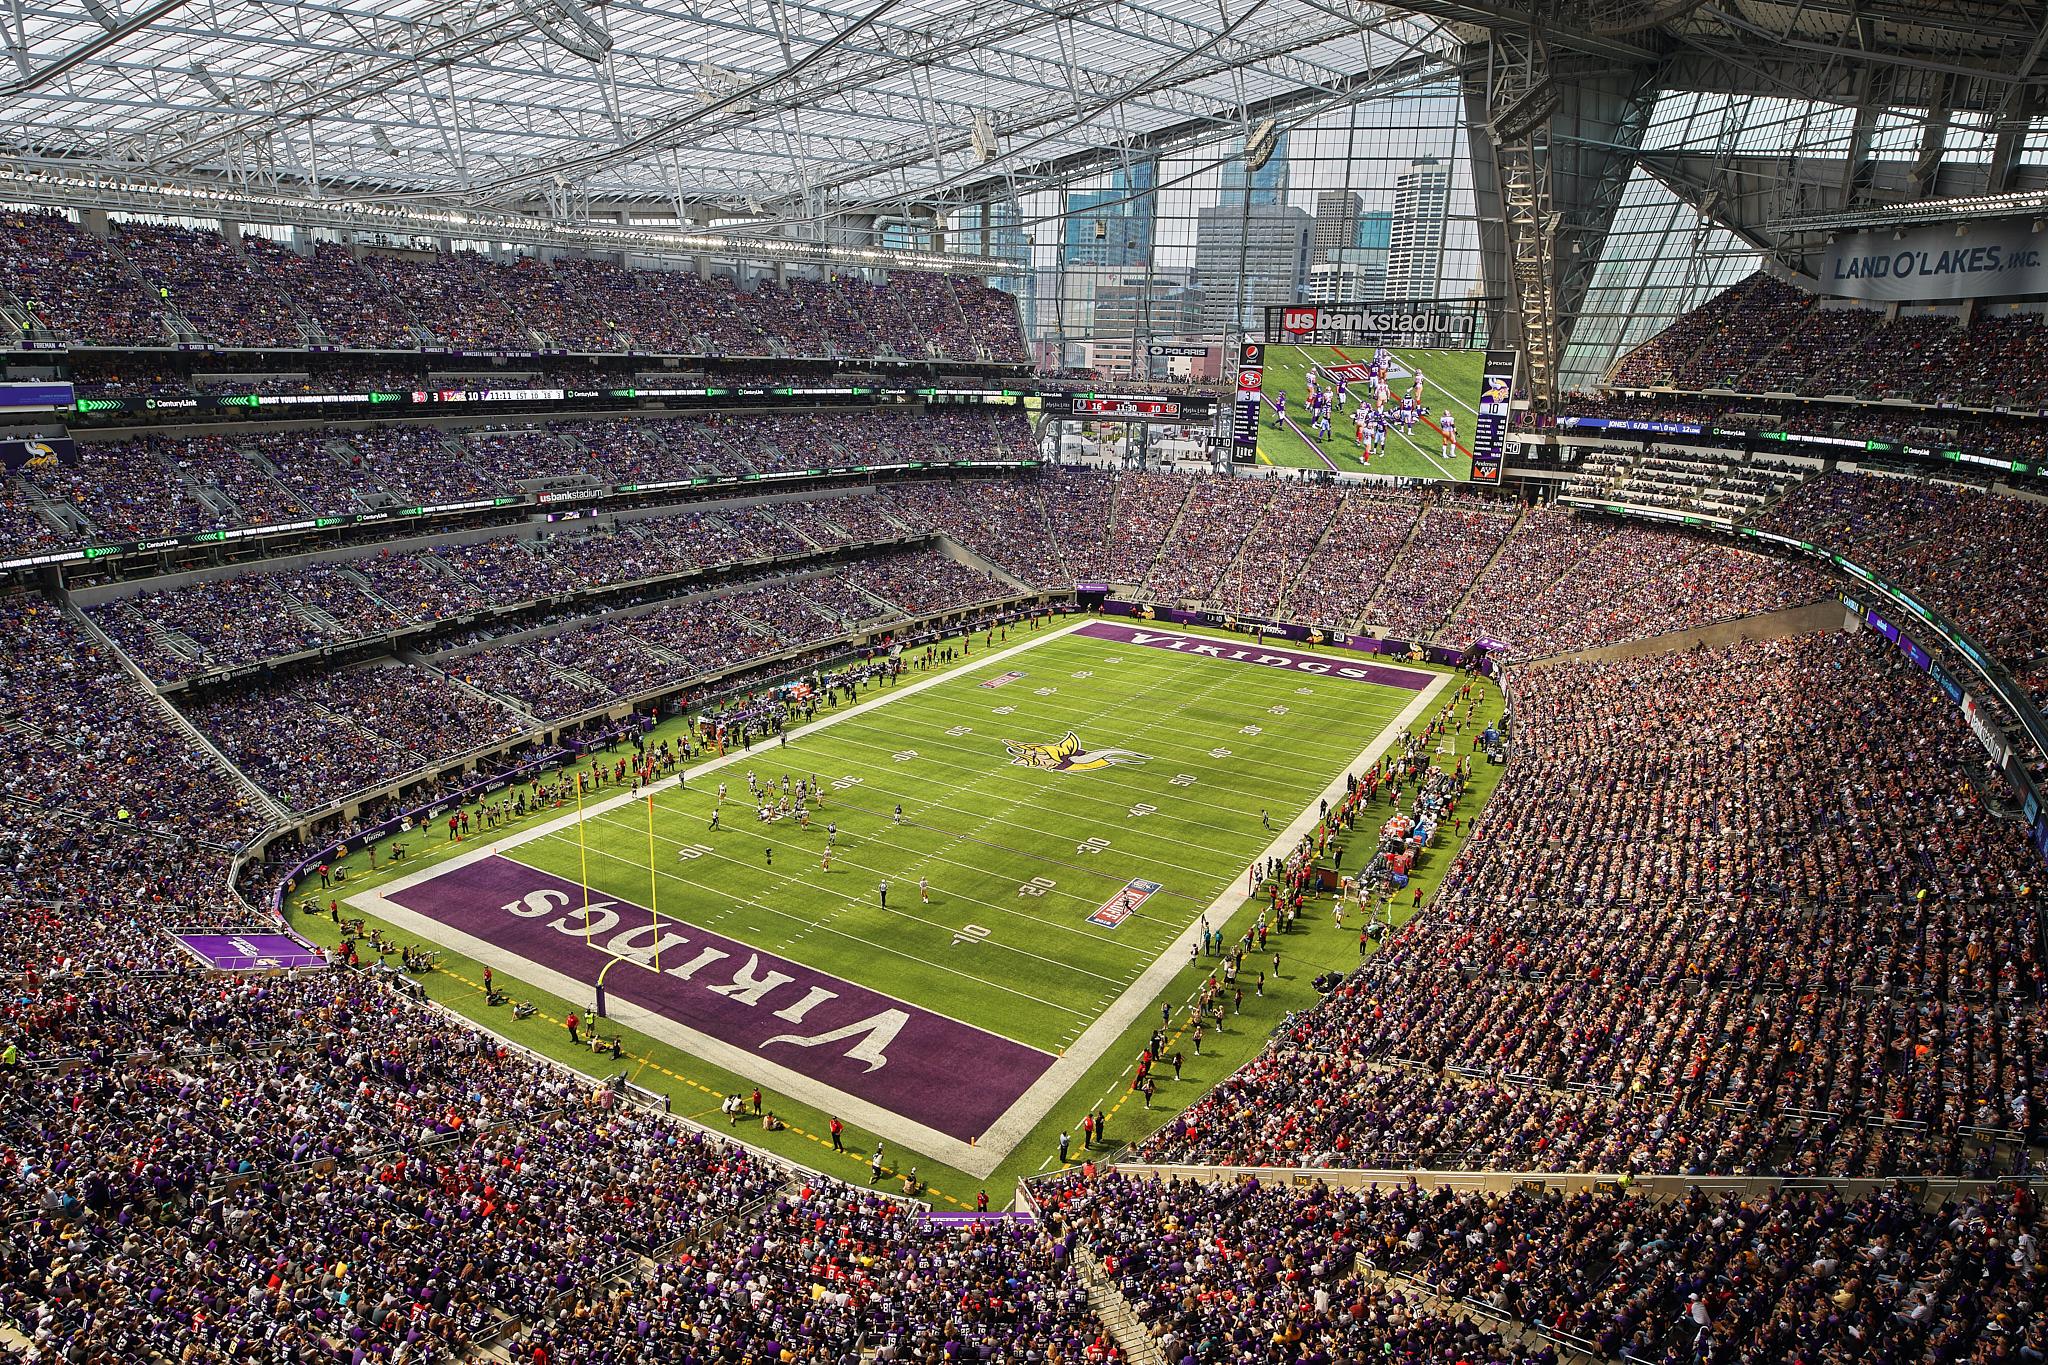 Minnesota_Vikings_Game_US_Bank_Stadium_Minneapolis_Minnesota_Photography_By_Joe_Lemke_055.JPG